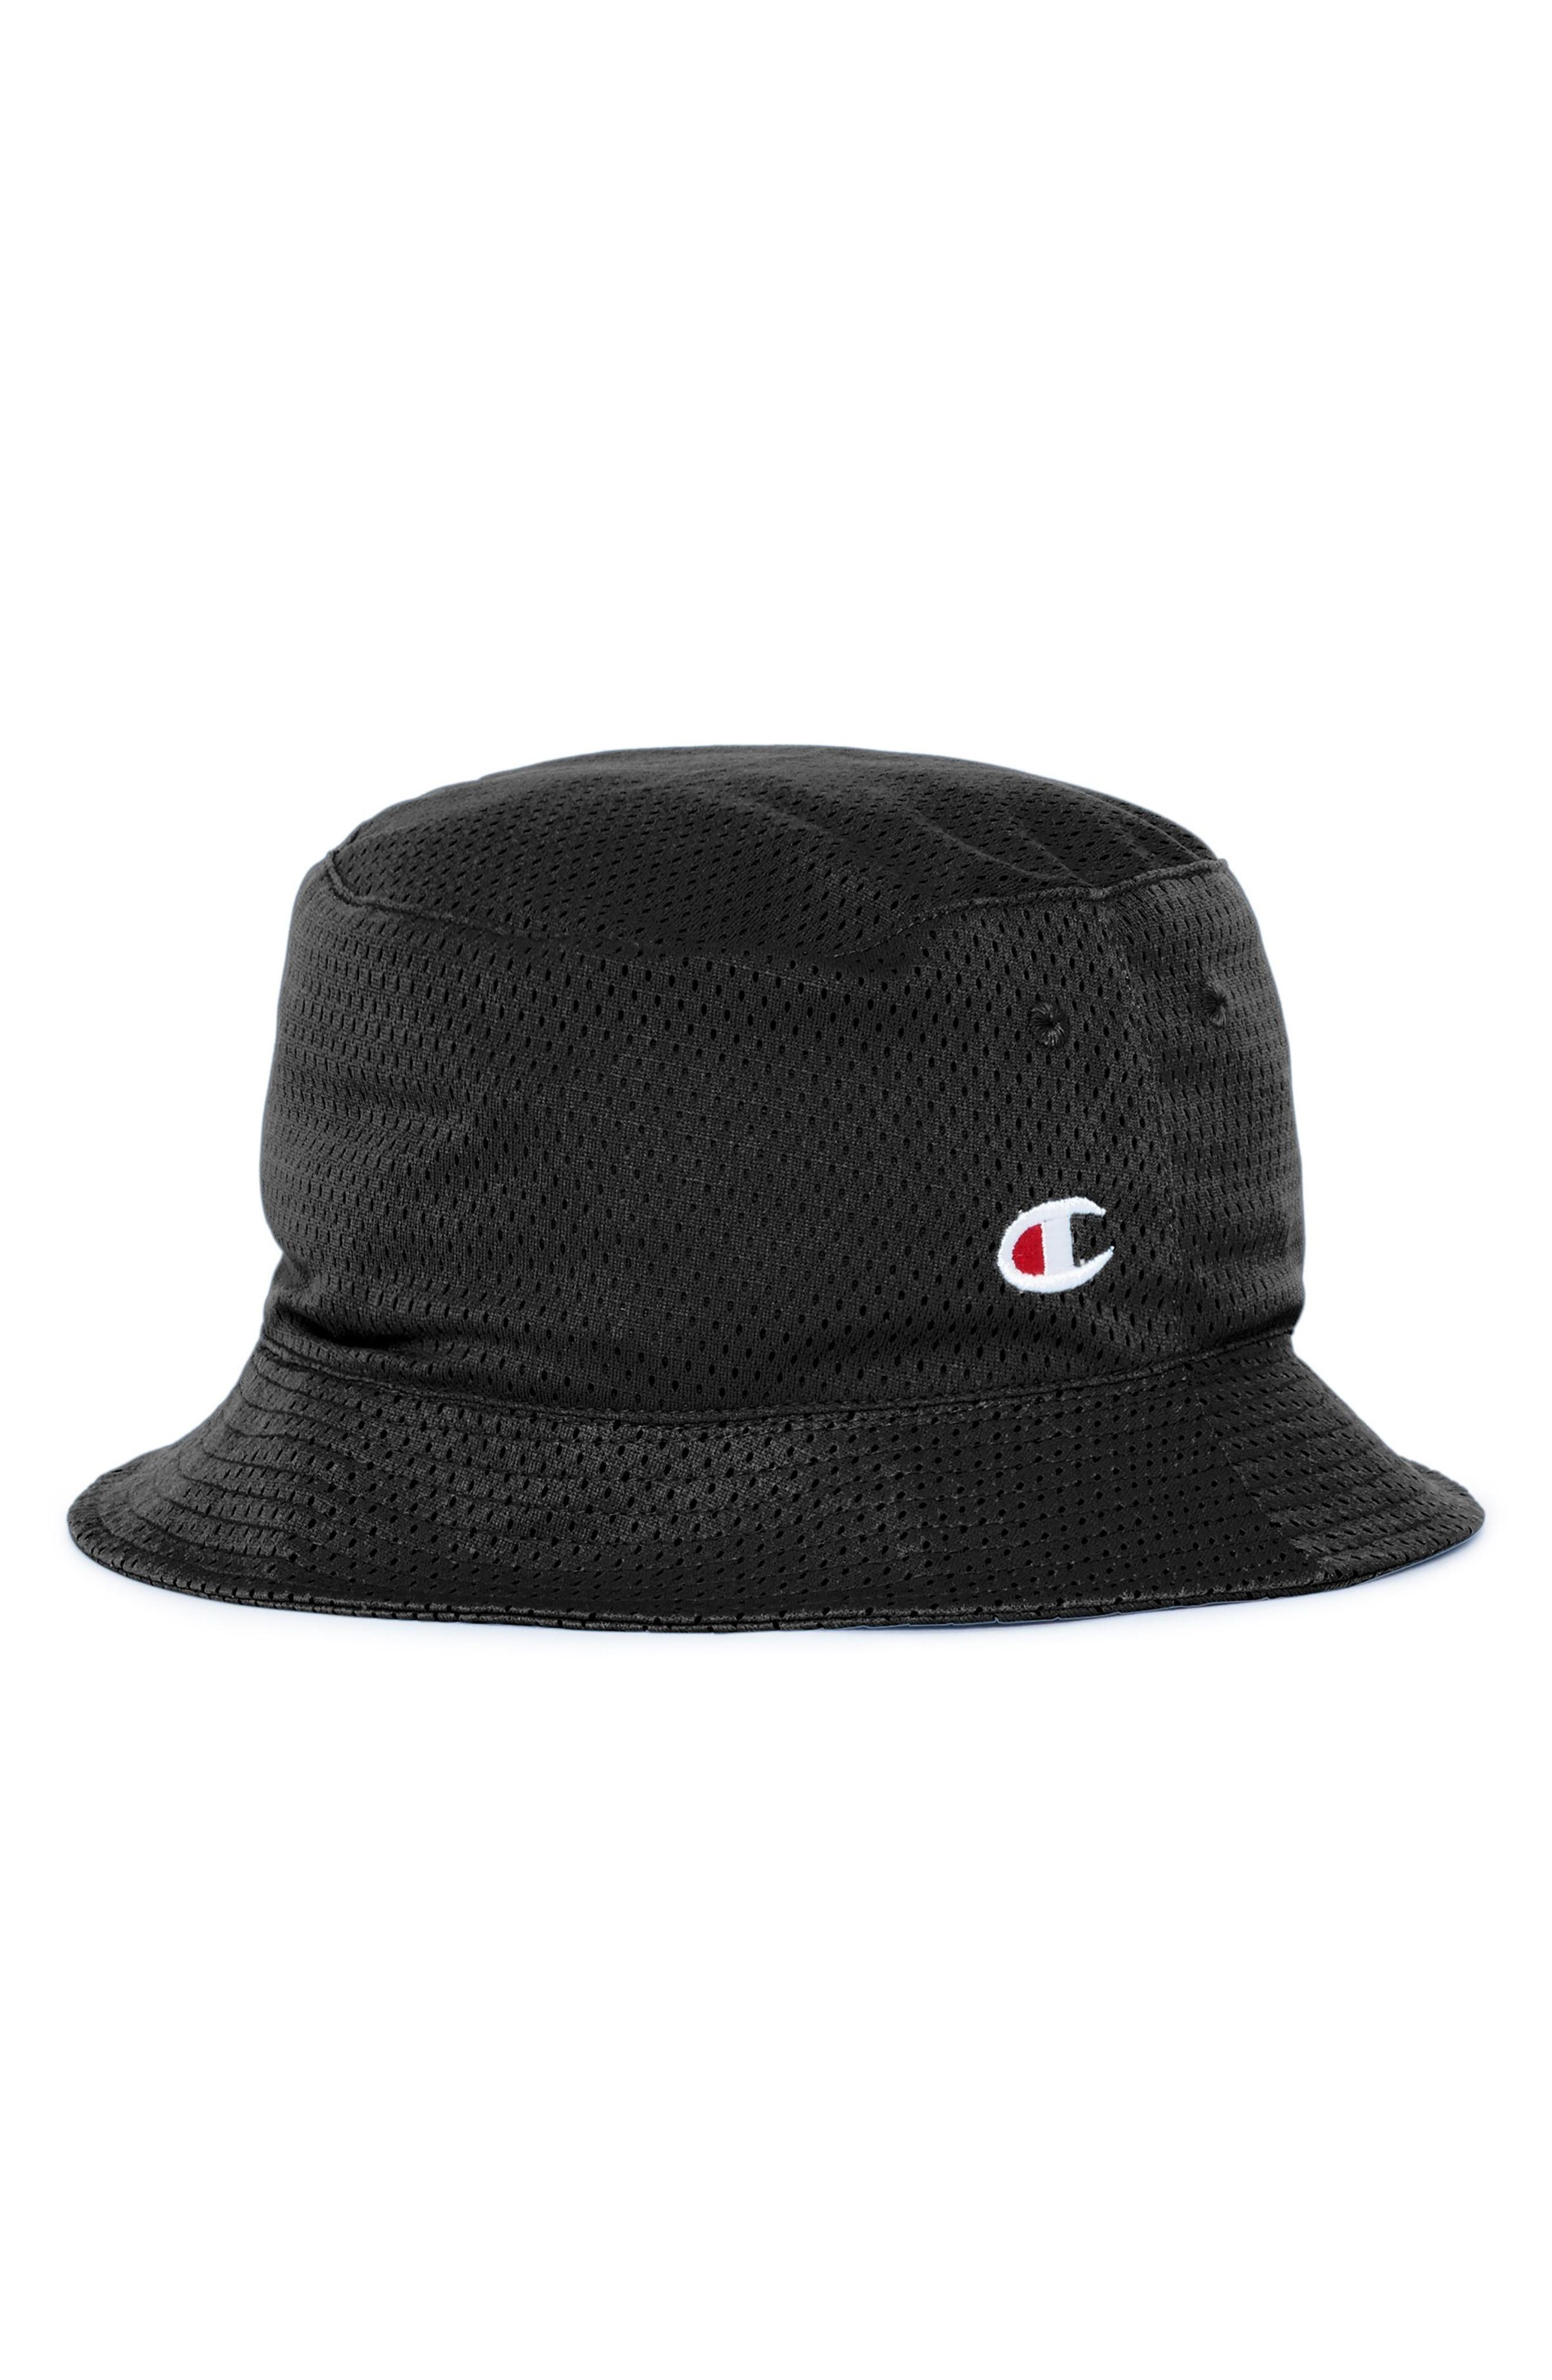 d90f65ceb40 Champion Reversible Mesh Bucket Hat In Silverstone  Black